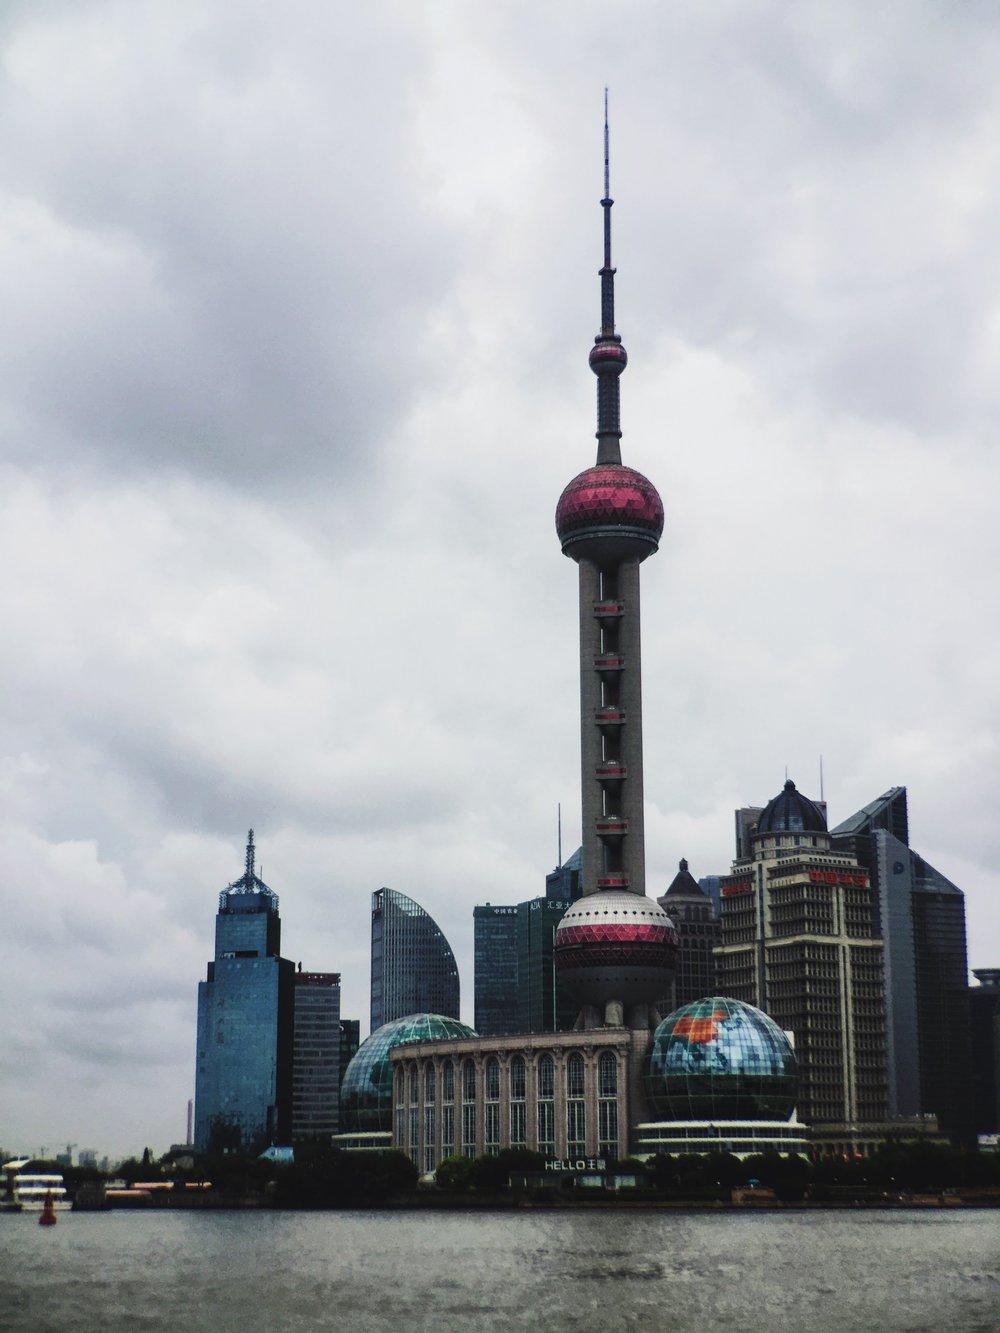 The McHowe World Tour - The Bund, Shanghai, China